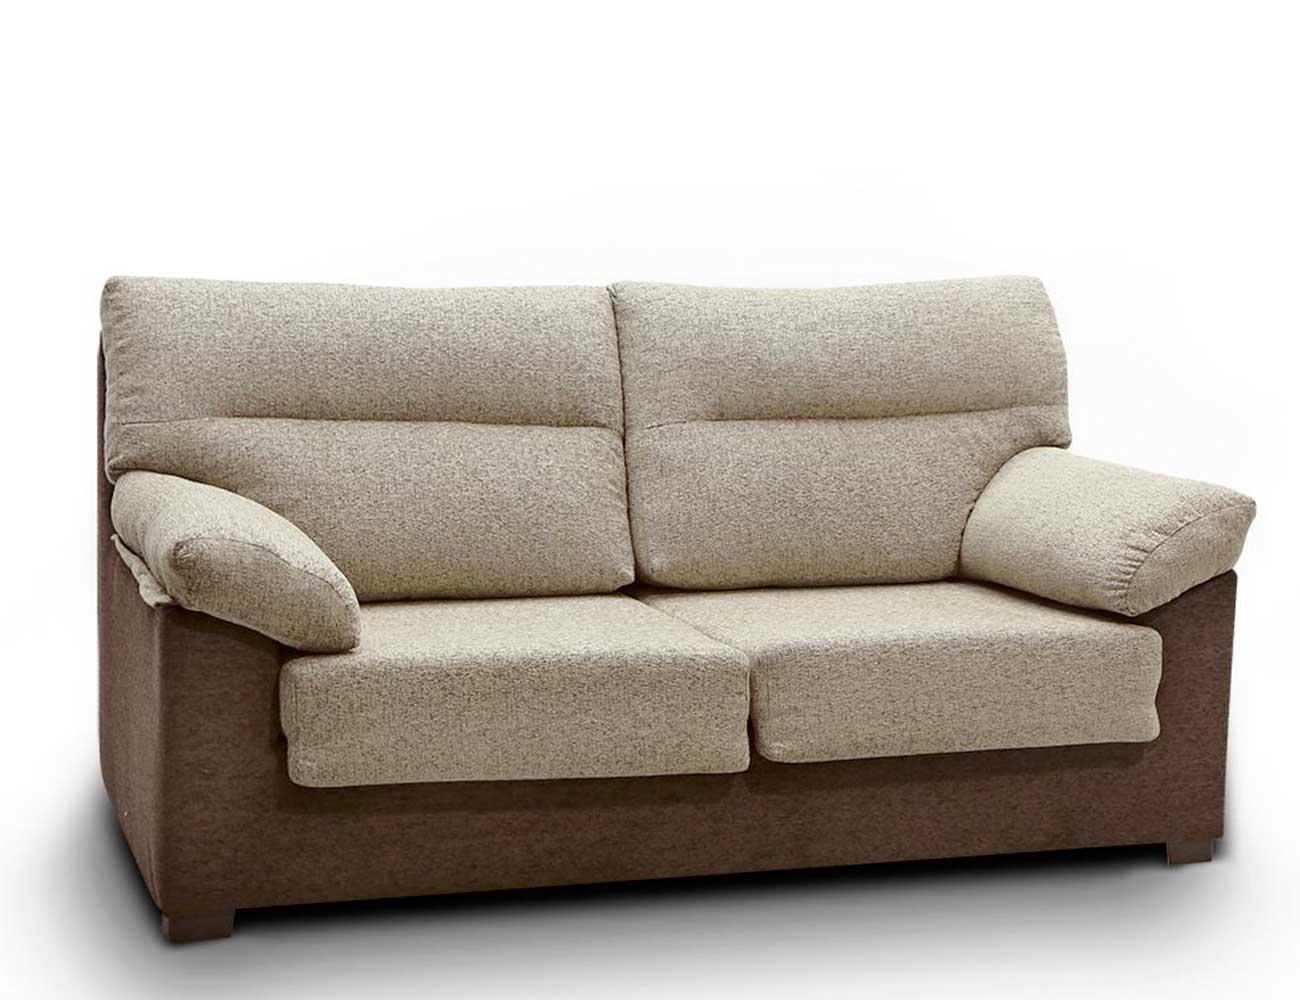 Sofa 3 plazas barato3